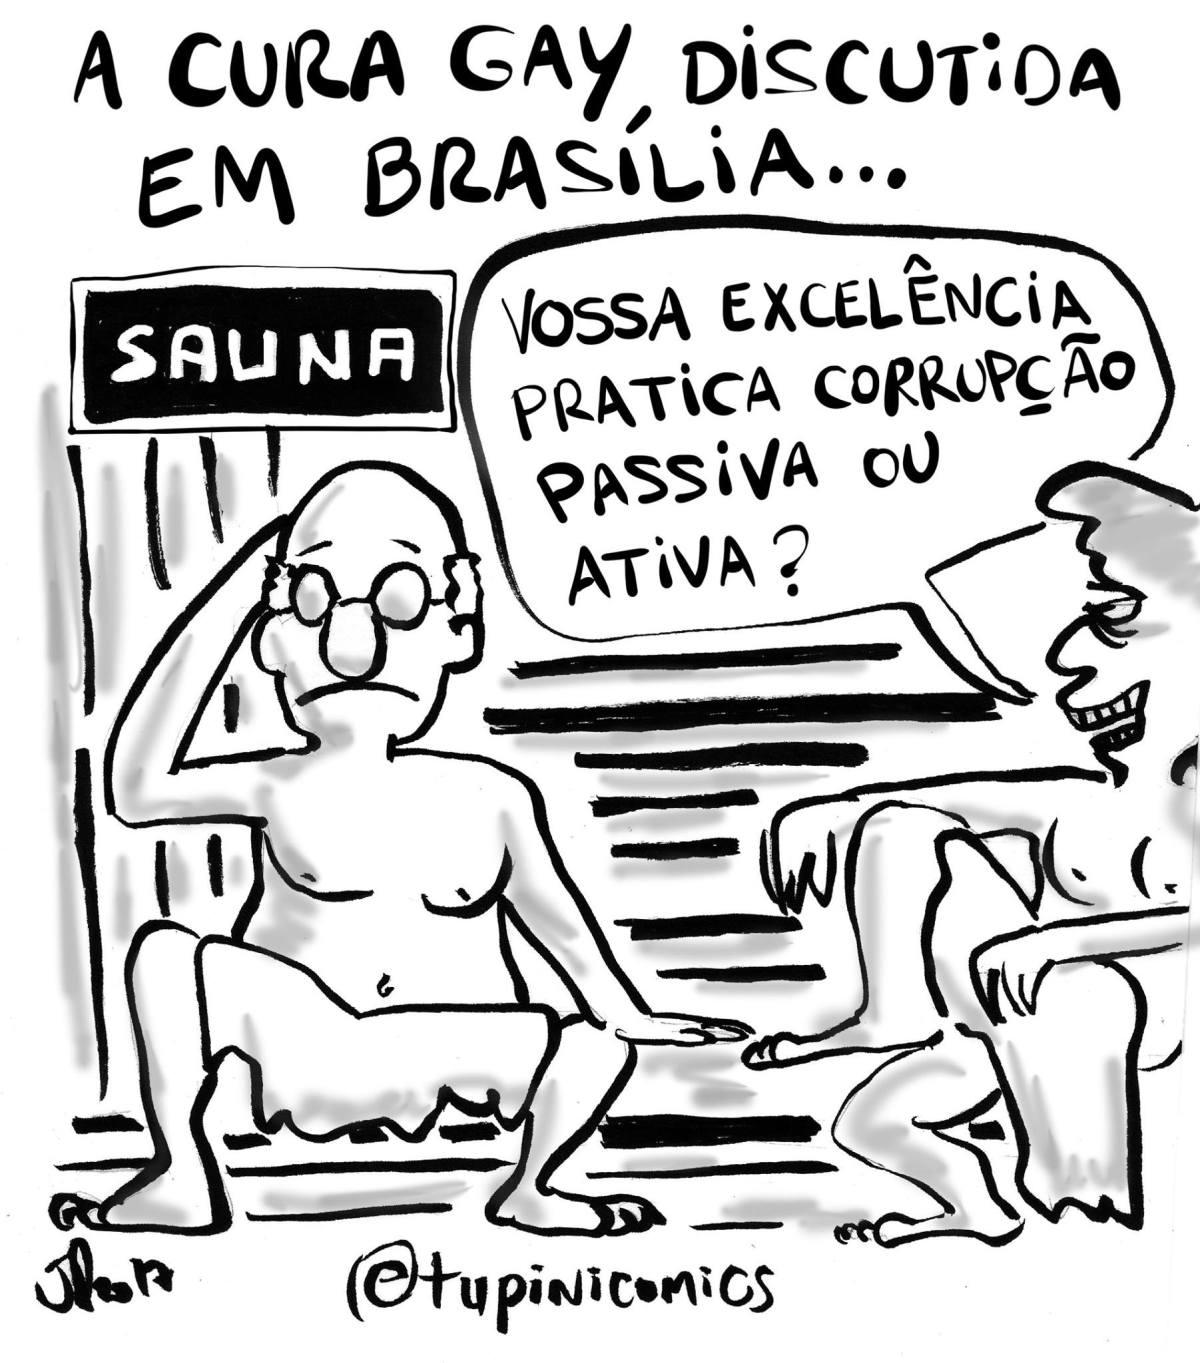 A cura gay discutida emBrasília